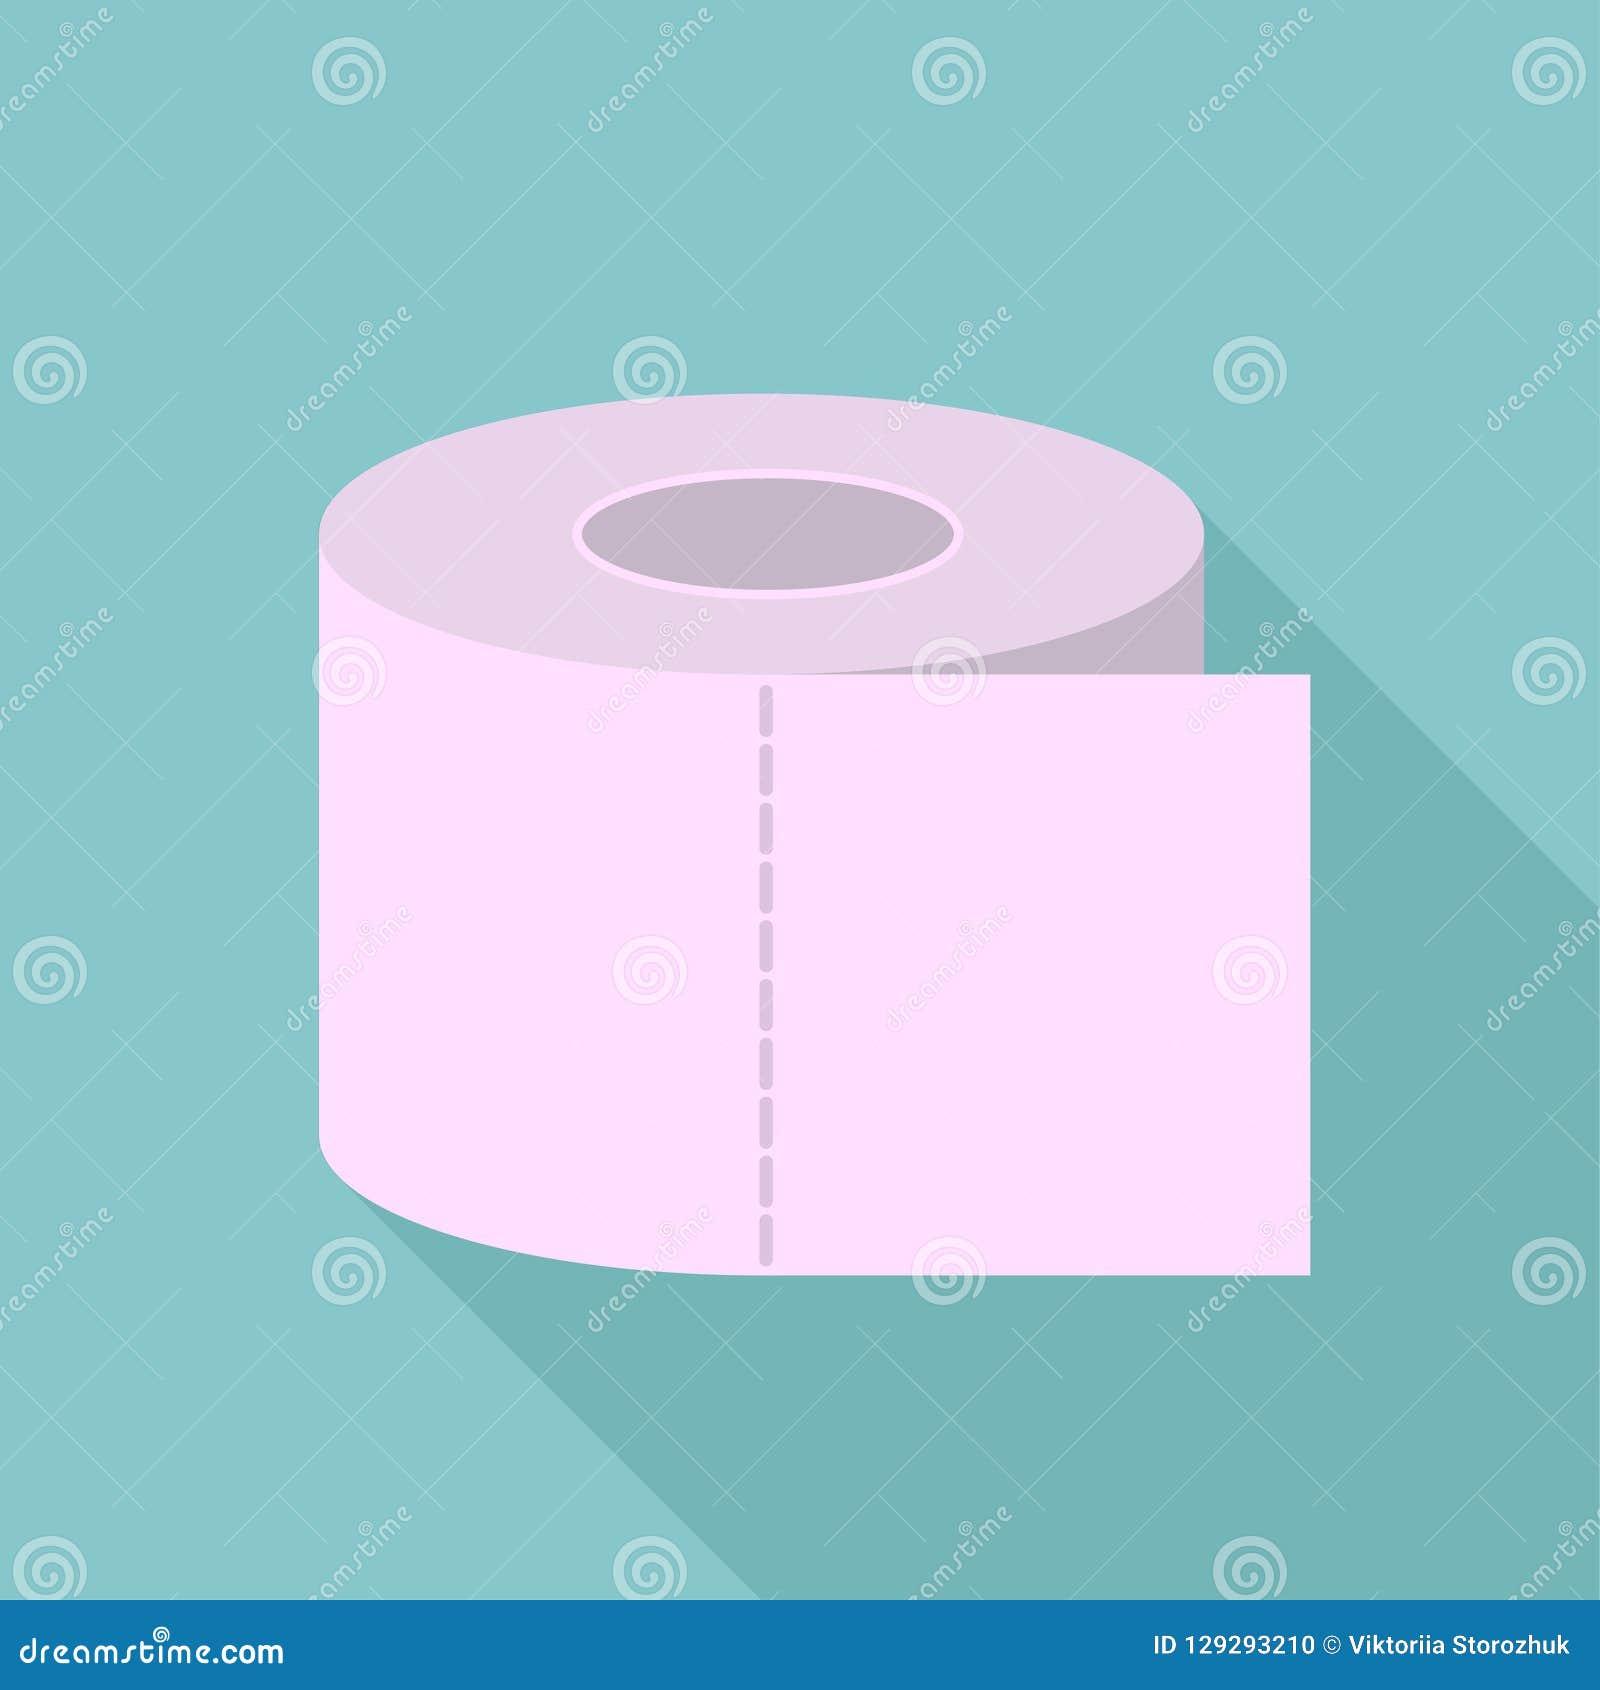 Farbiges Toilettenpapier, Toilettenpapier mit langem Schatten, Toilettenpapierlogo